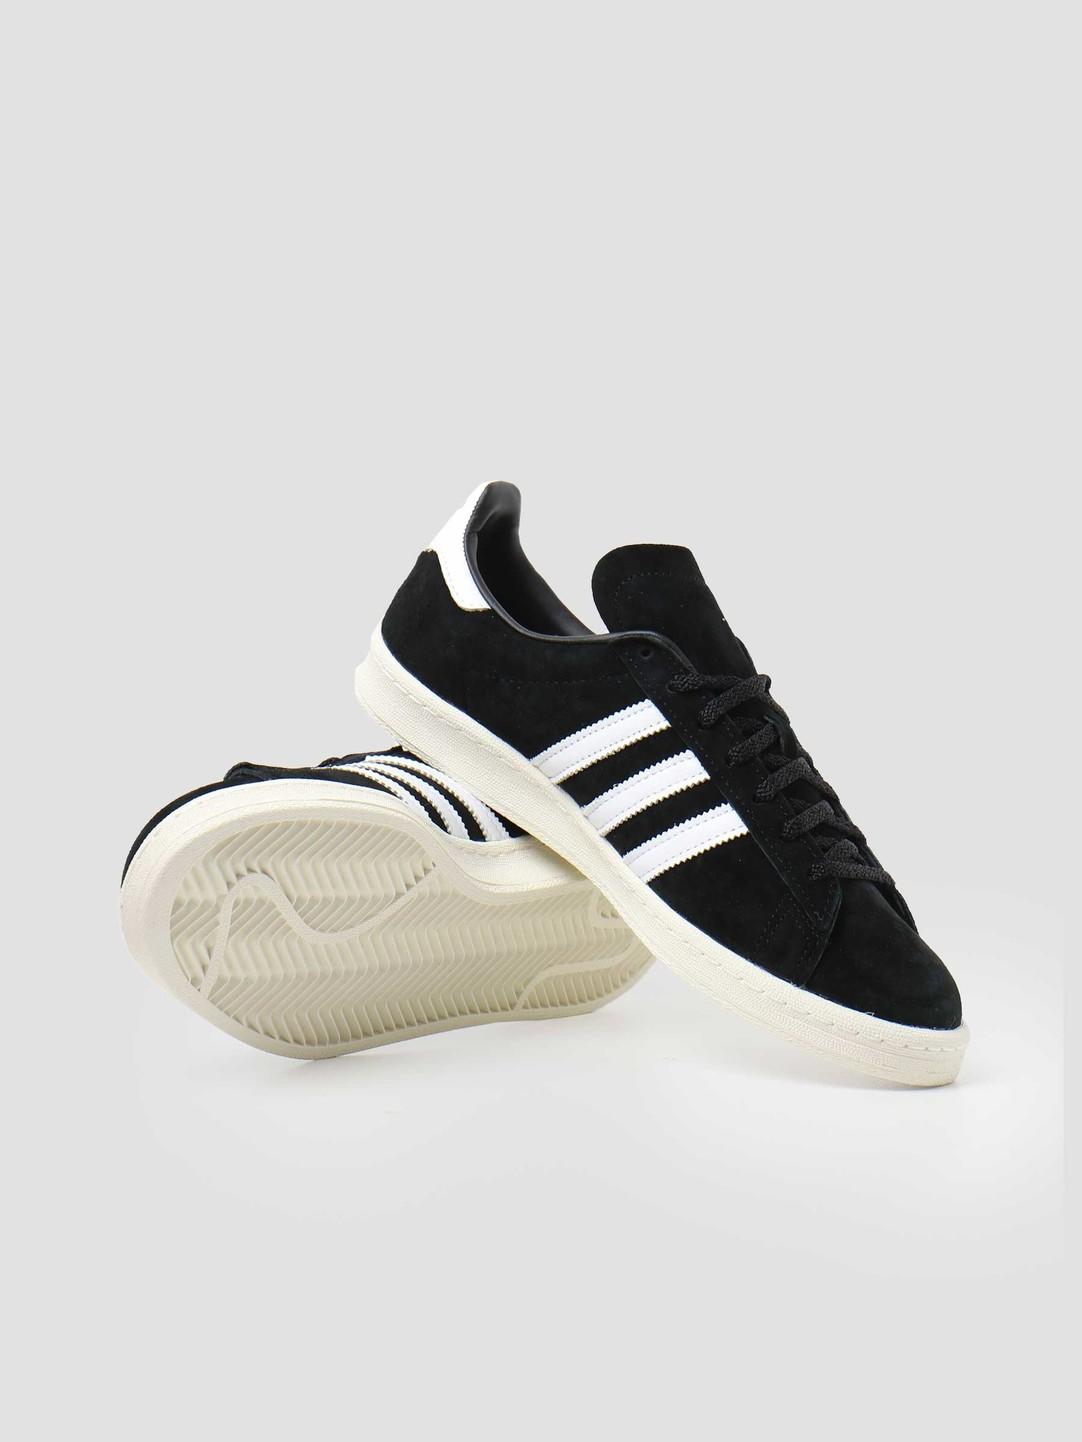 adidas adidas Campus 80S Black White FX5438